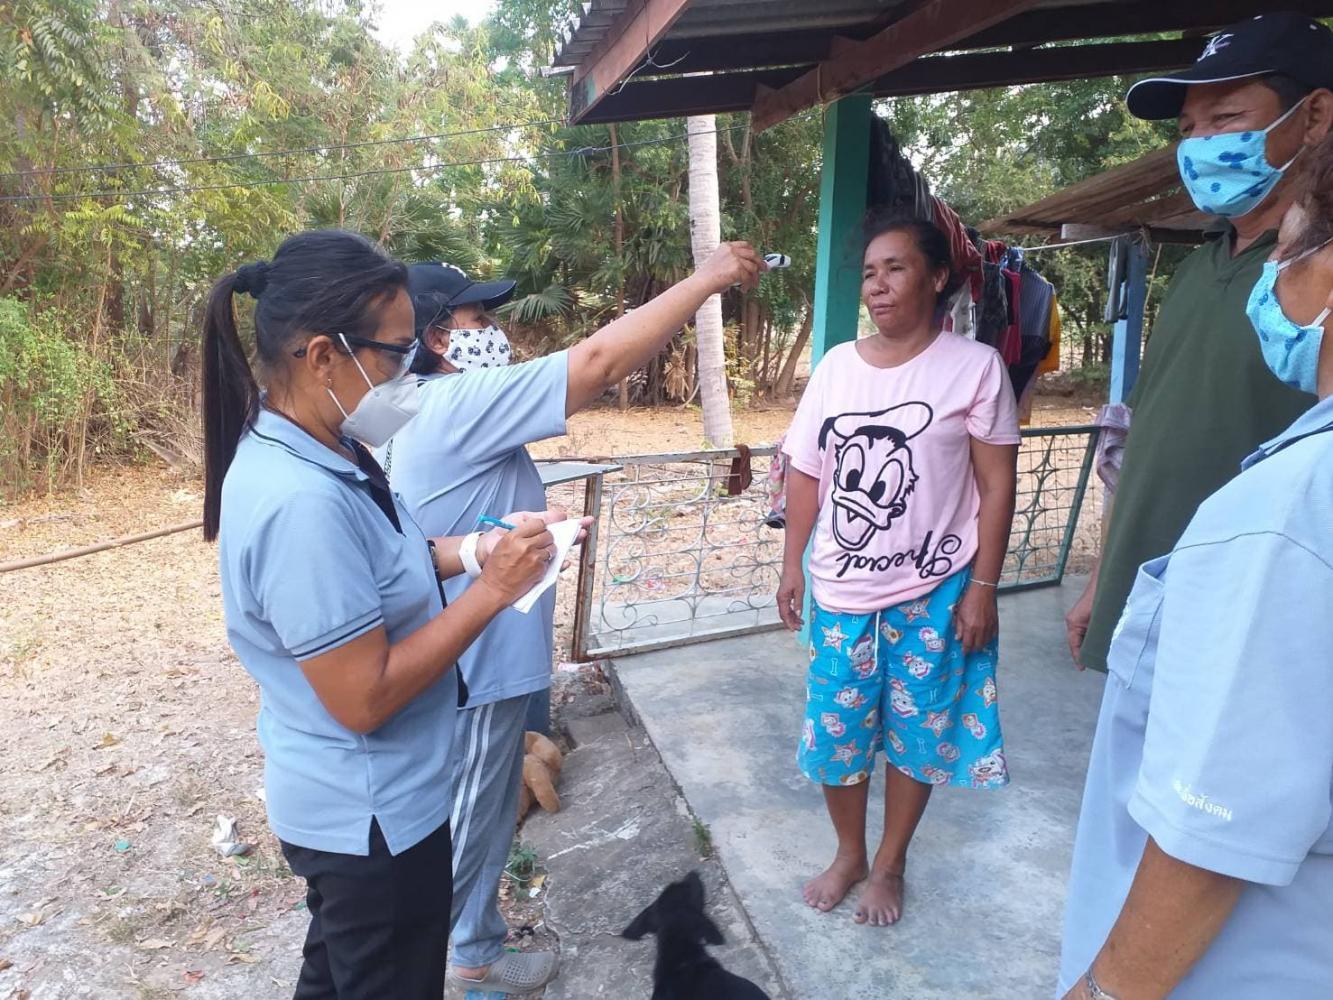 Village health volunteers take the body temperature of a resident during a door-to-door visit in Prachuap Khiri Khan in April.Nopphanat Subhakul